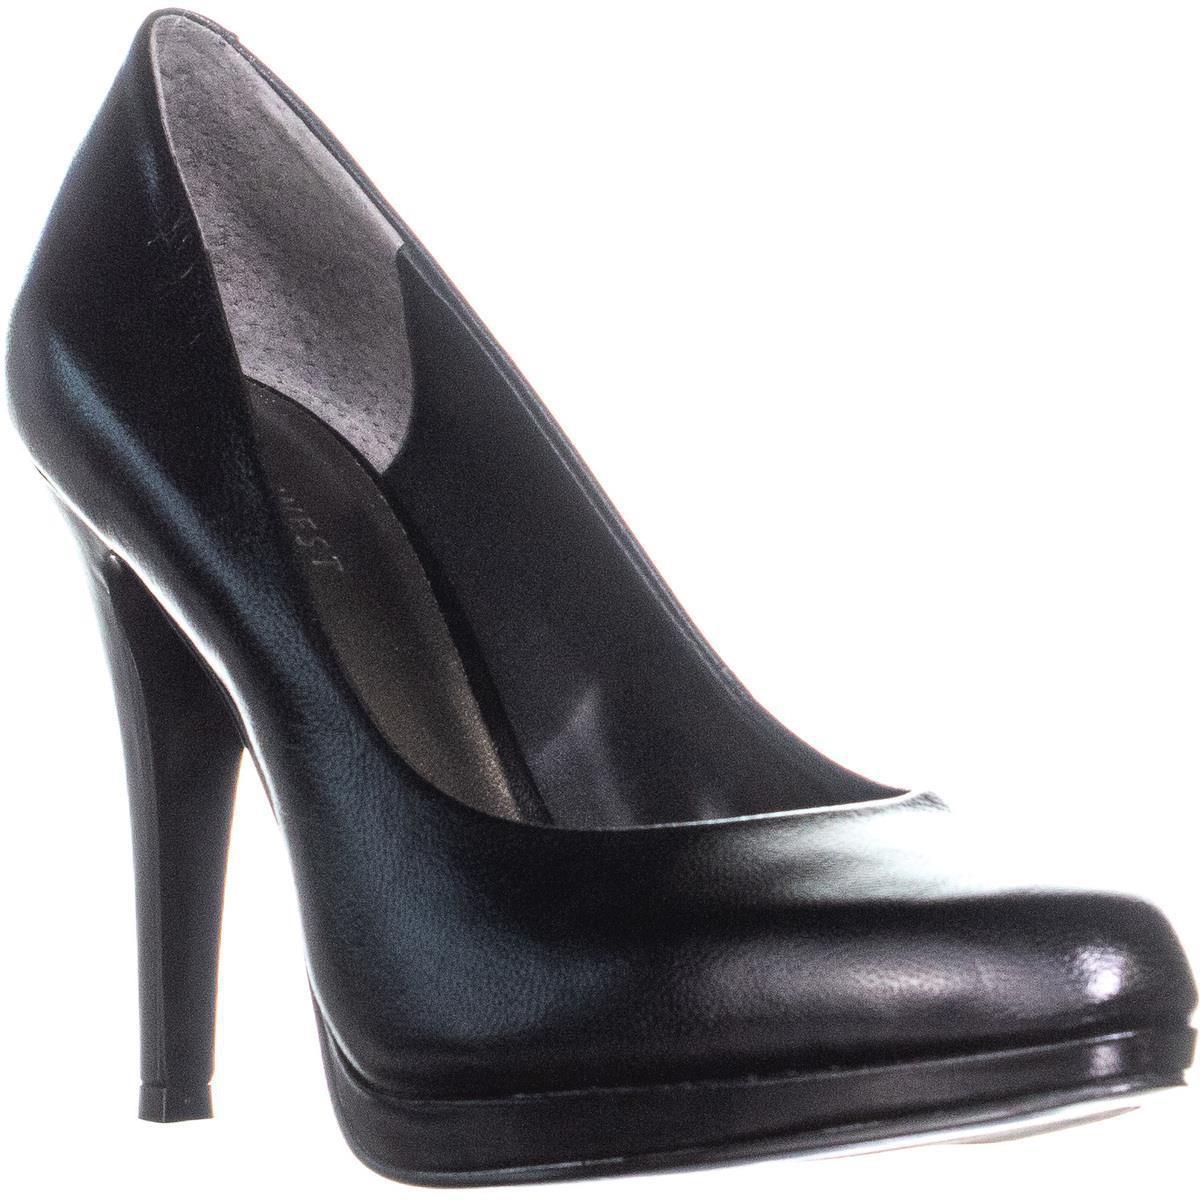 224dbb3143f Nine West Rocha Slip On Front Platform Classic Heels in Black - Lyst